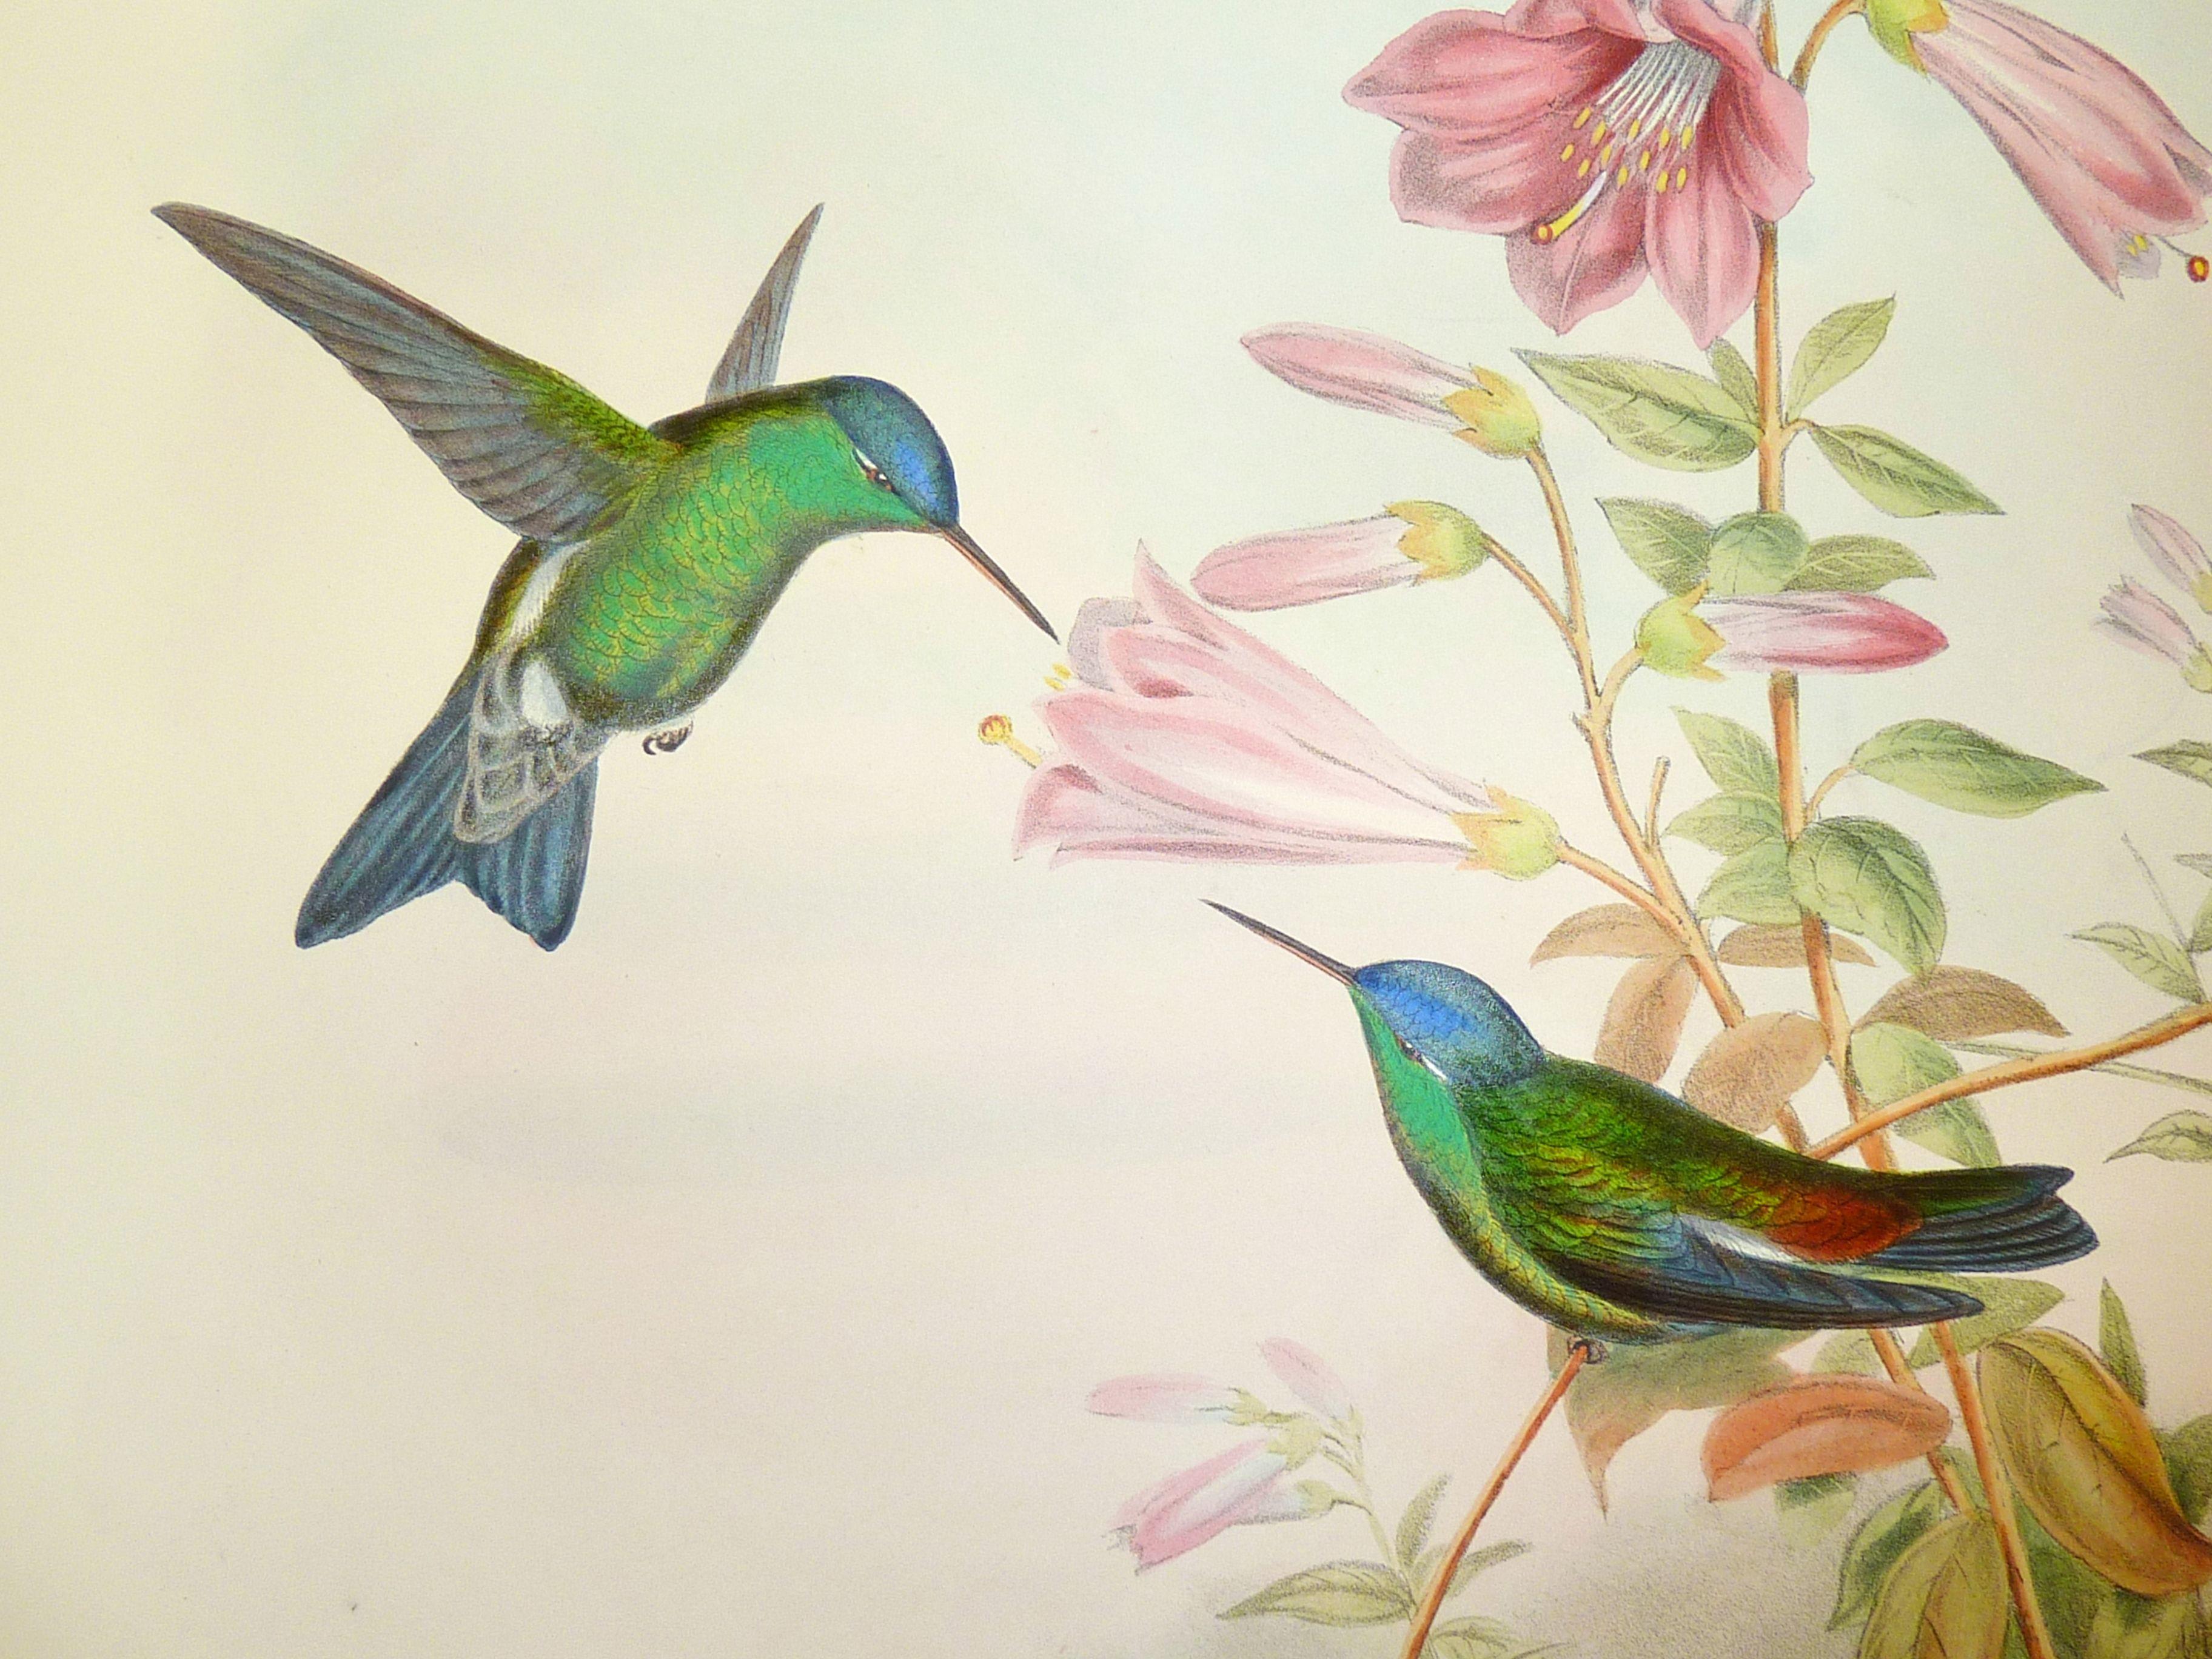 3648x2736 John Gould's Hummingbirds A Victorian Obsession Bird